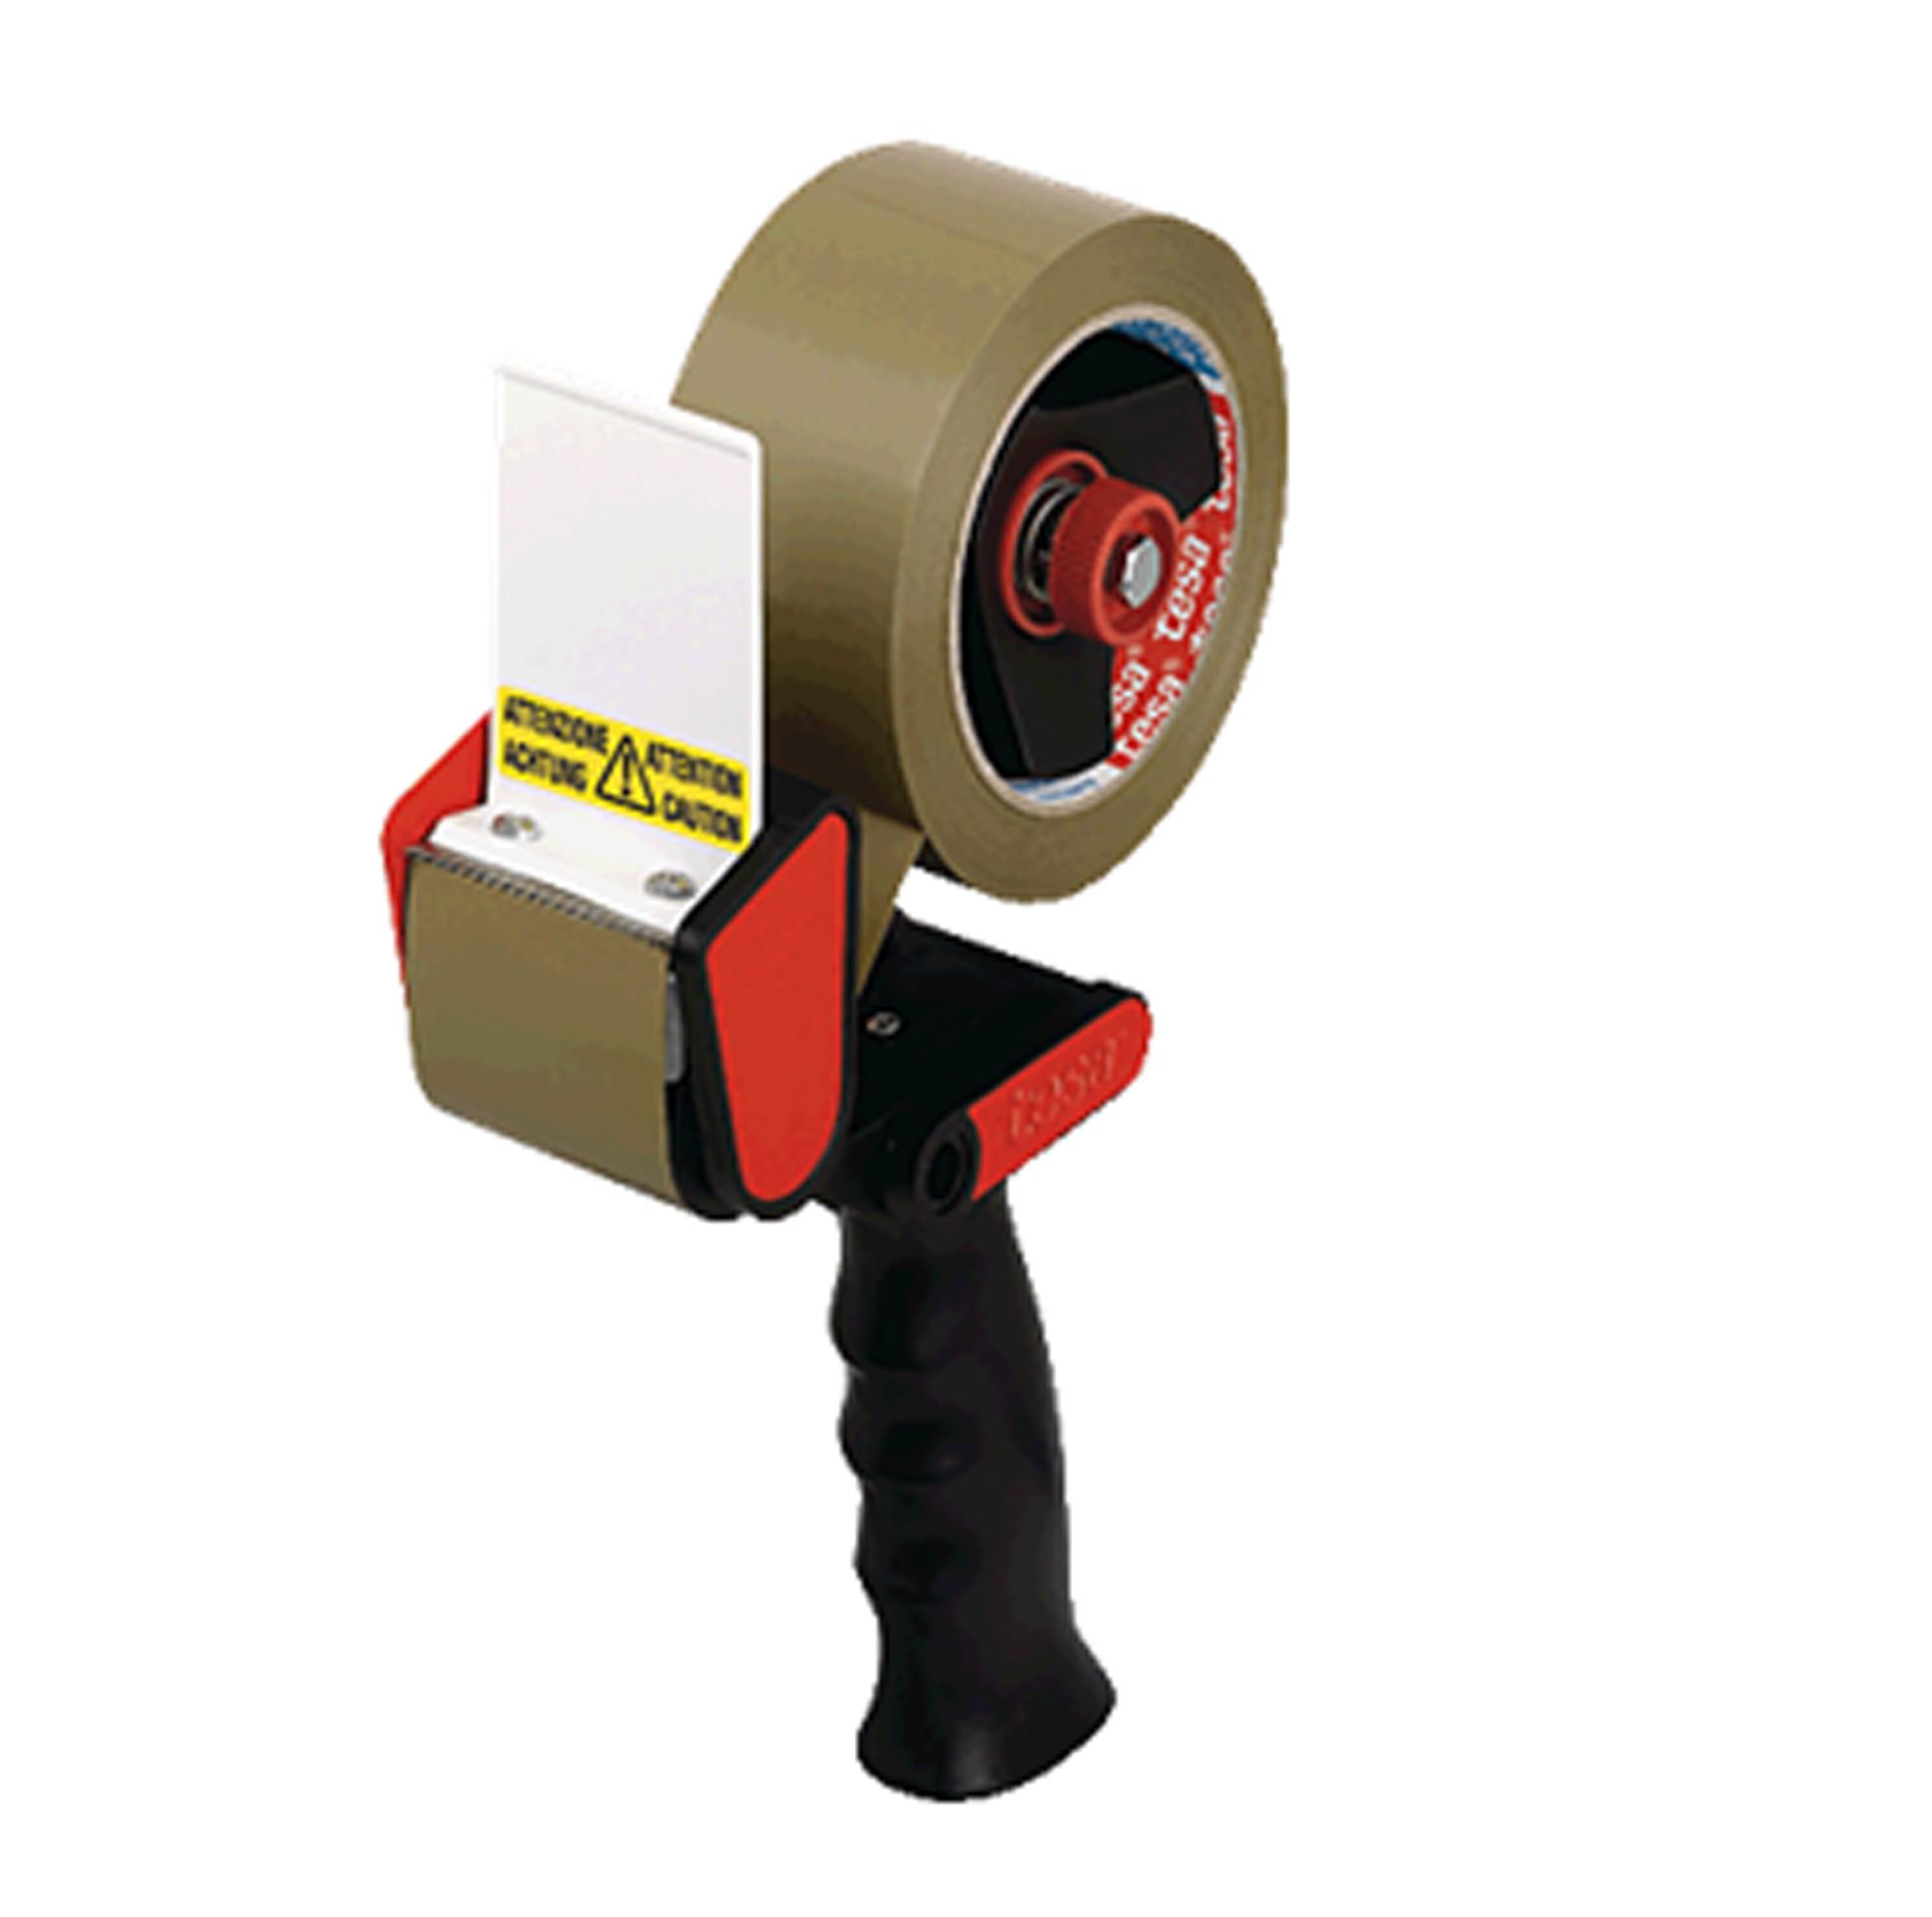 tesapack-handabroller-classic